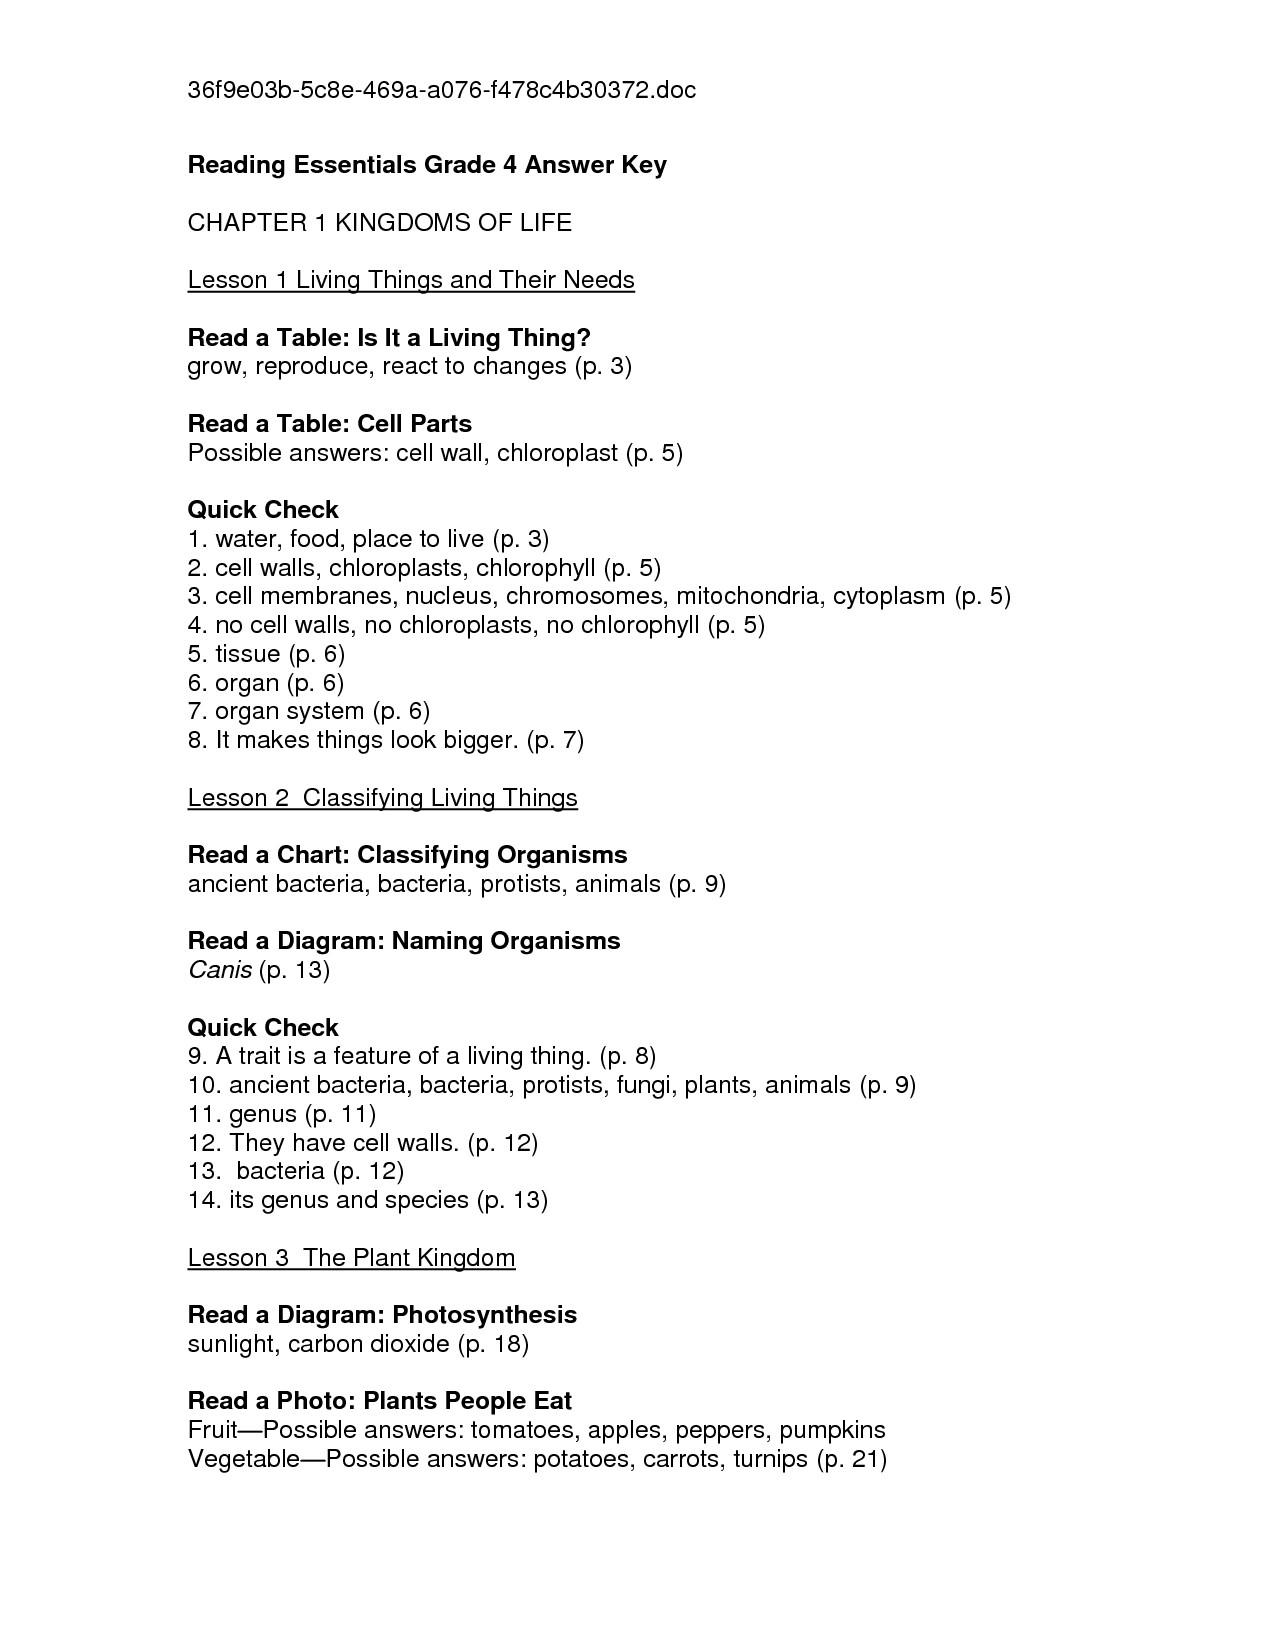 Nutrient Cycles Worksheet Answers Nitrogen Cycle Diagram Worksheet